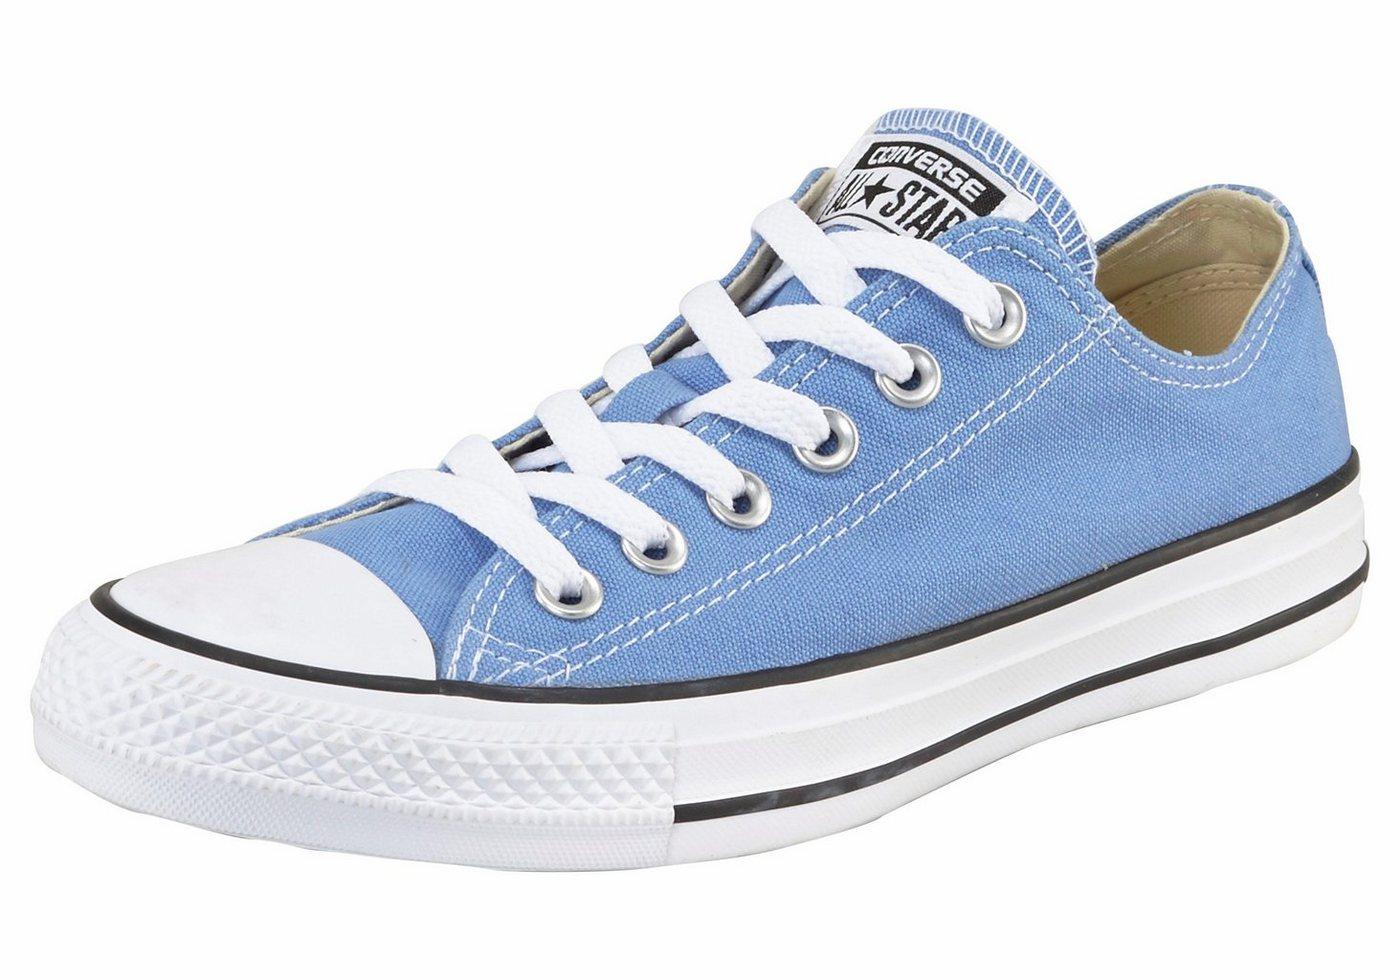 Converse »Chuck Taylor All Star Ox« Sneaker, Seasonal Da